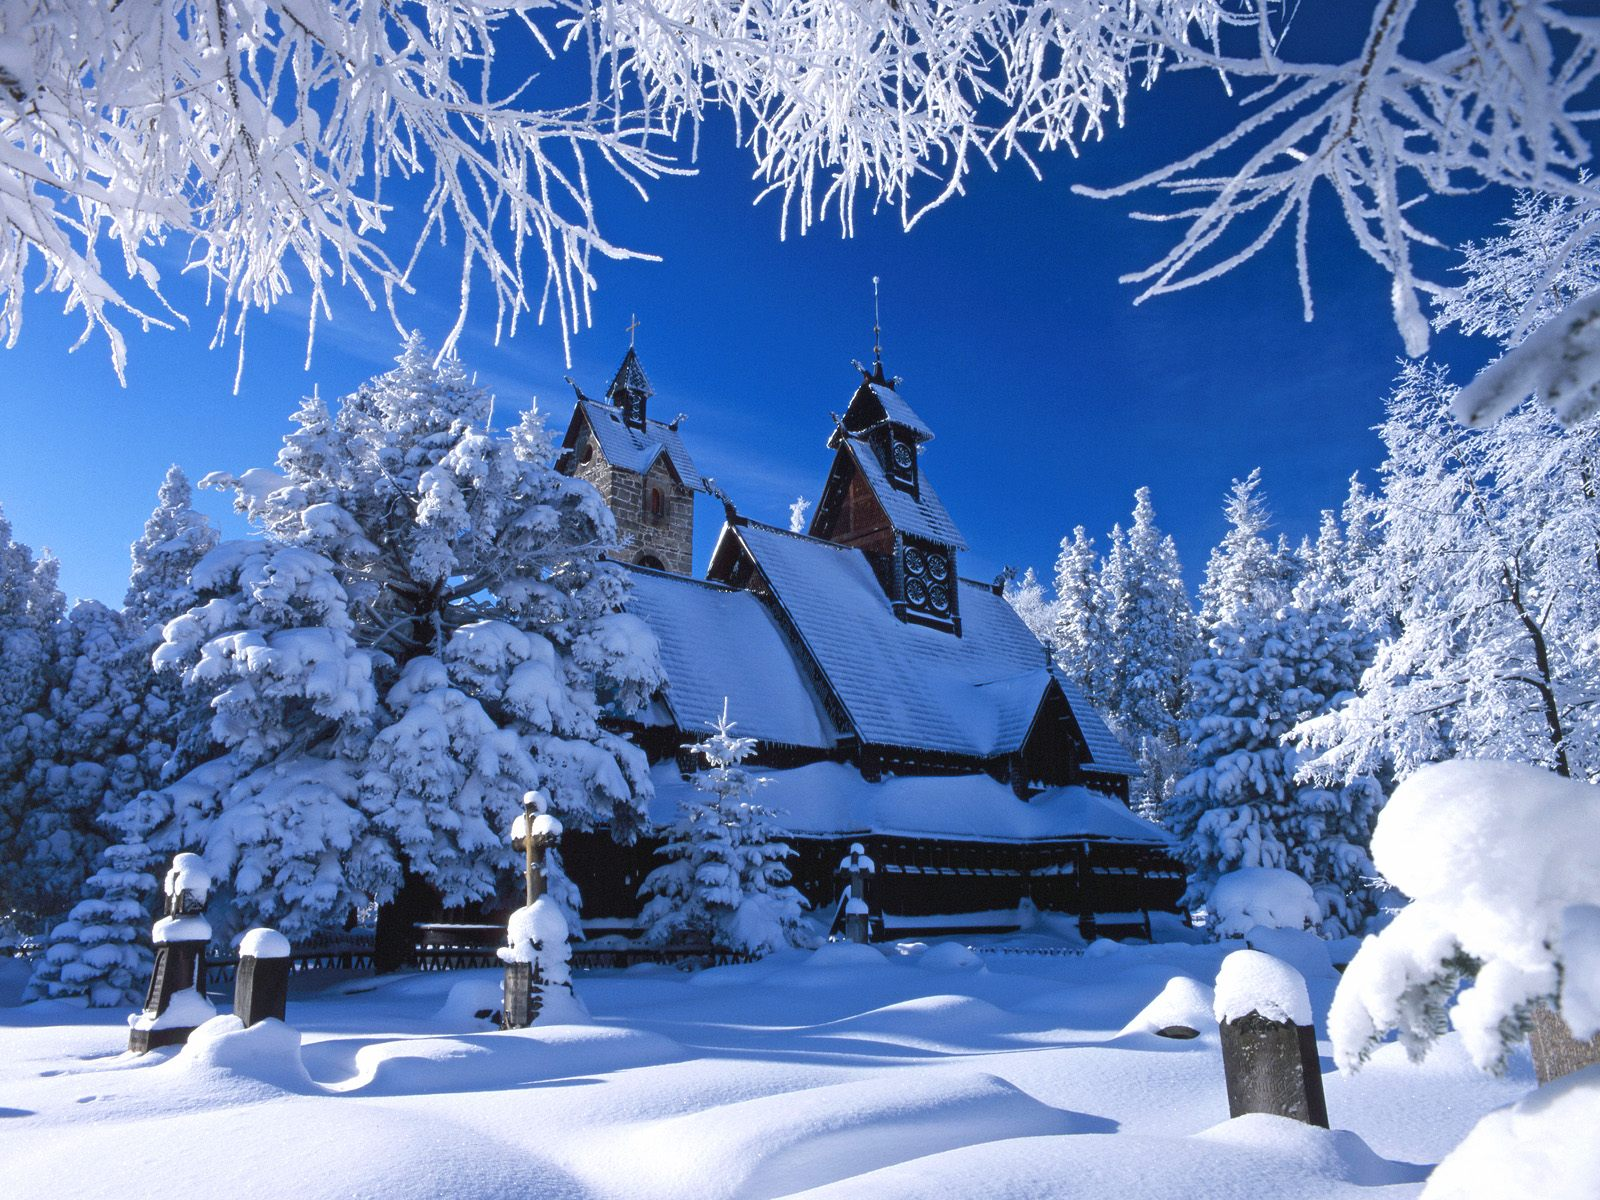 Фото зима открытки